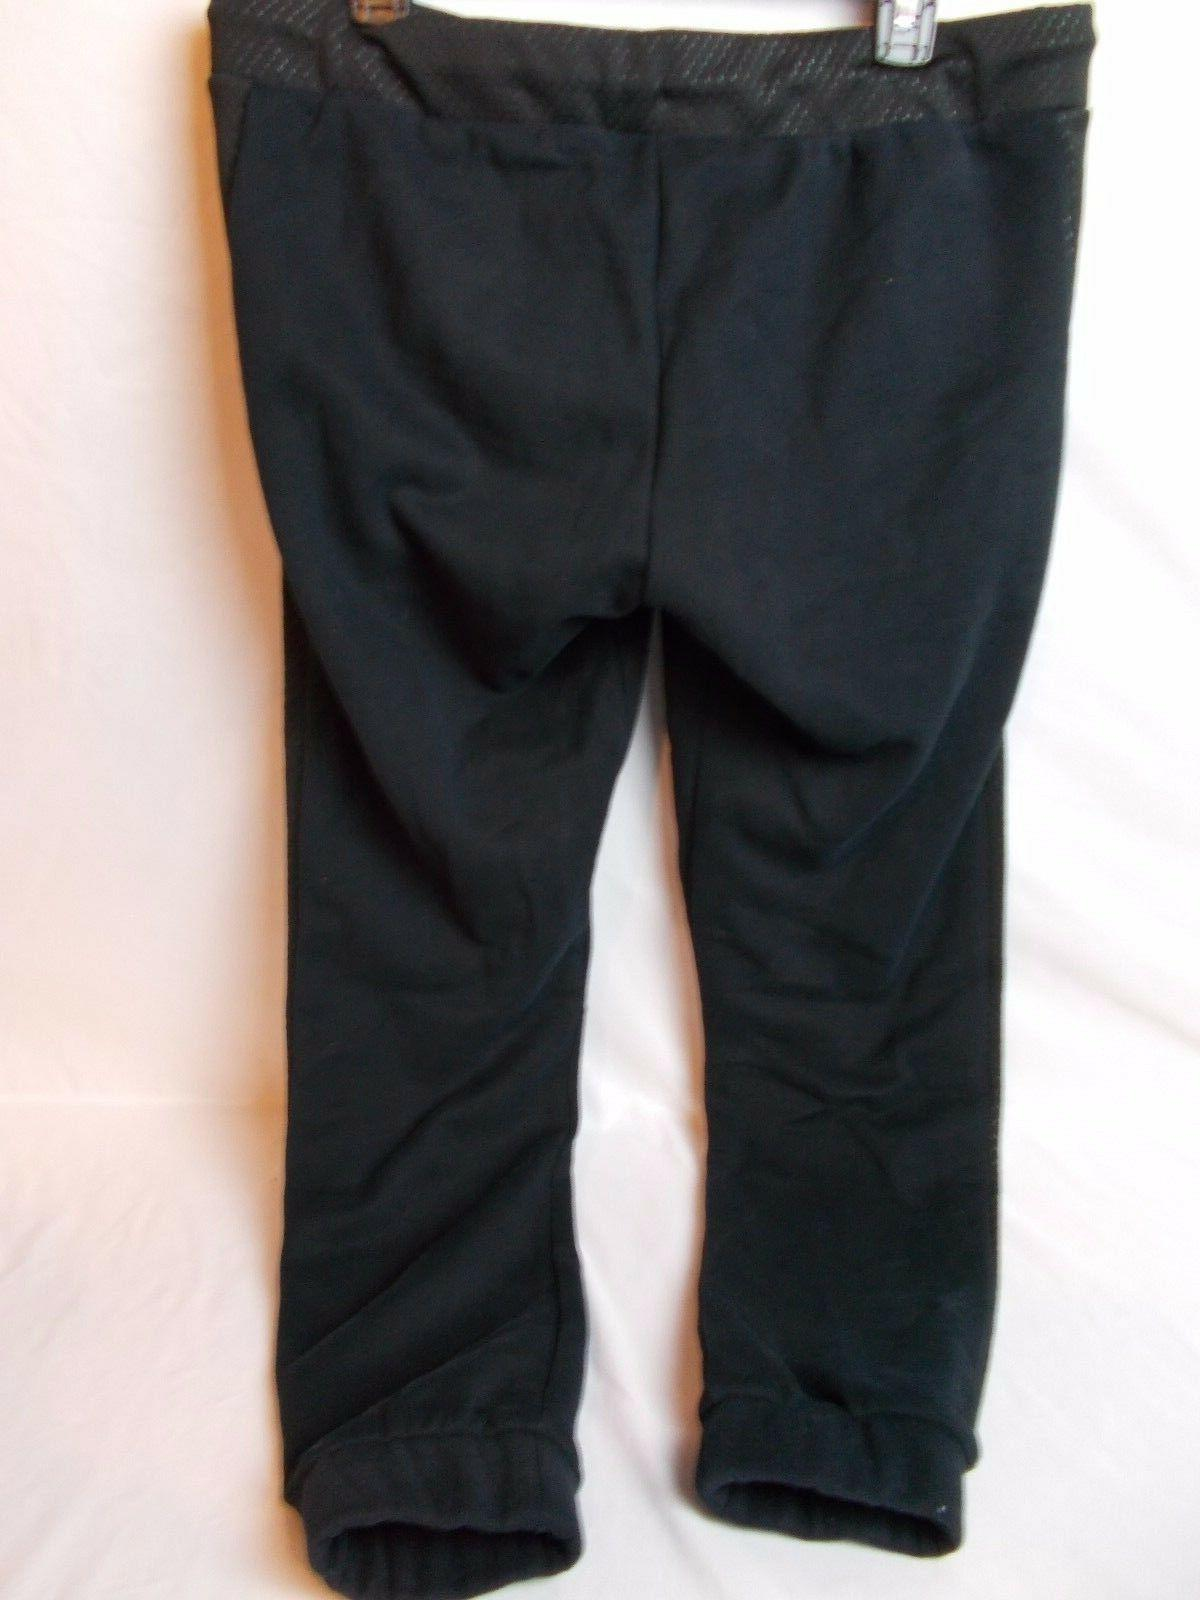 Puma Women's Pants Black X-Large